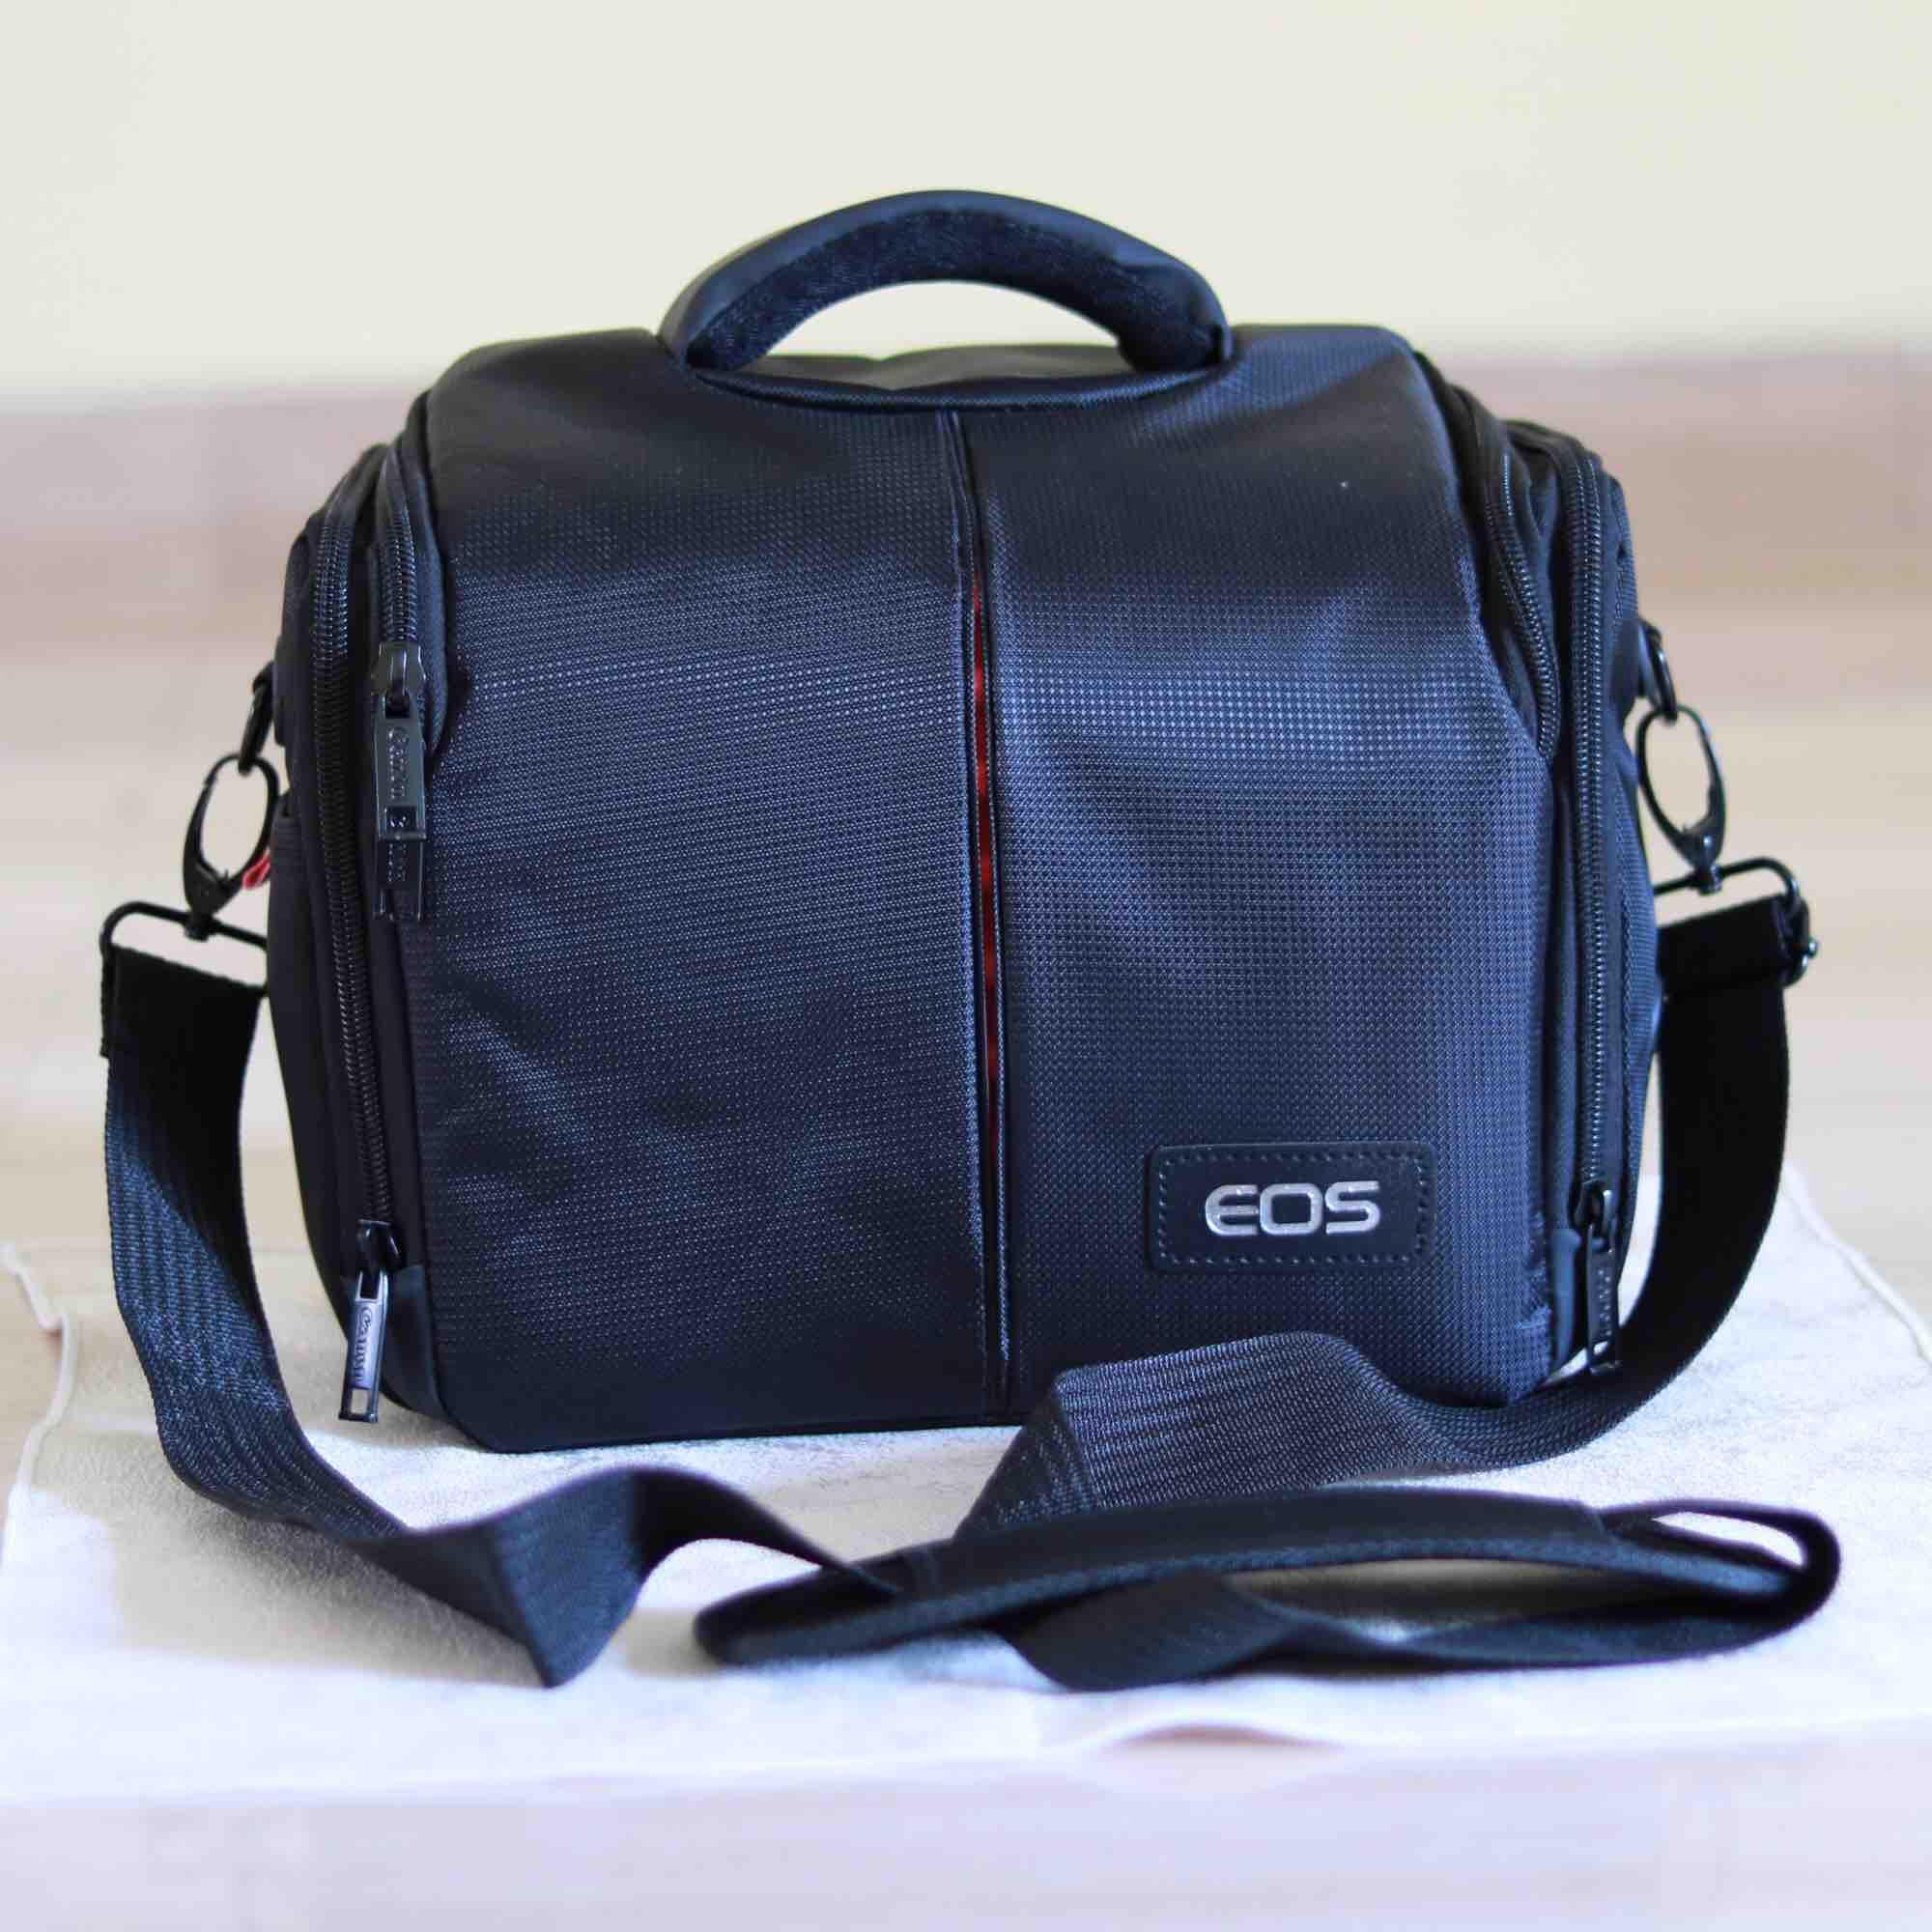 cf04615d70c3 Buy Camera Cases | Camera Covers | Bags | Lazada